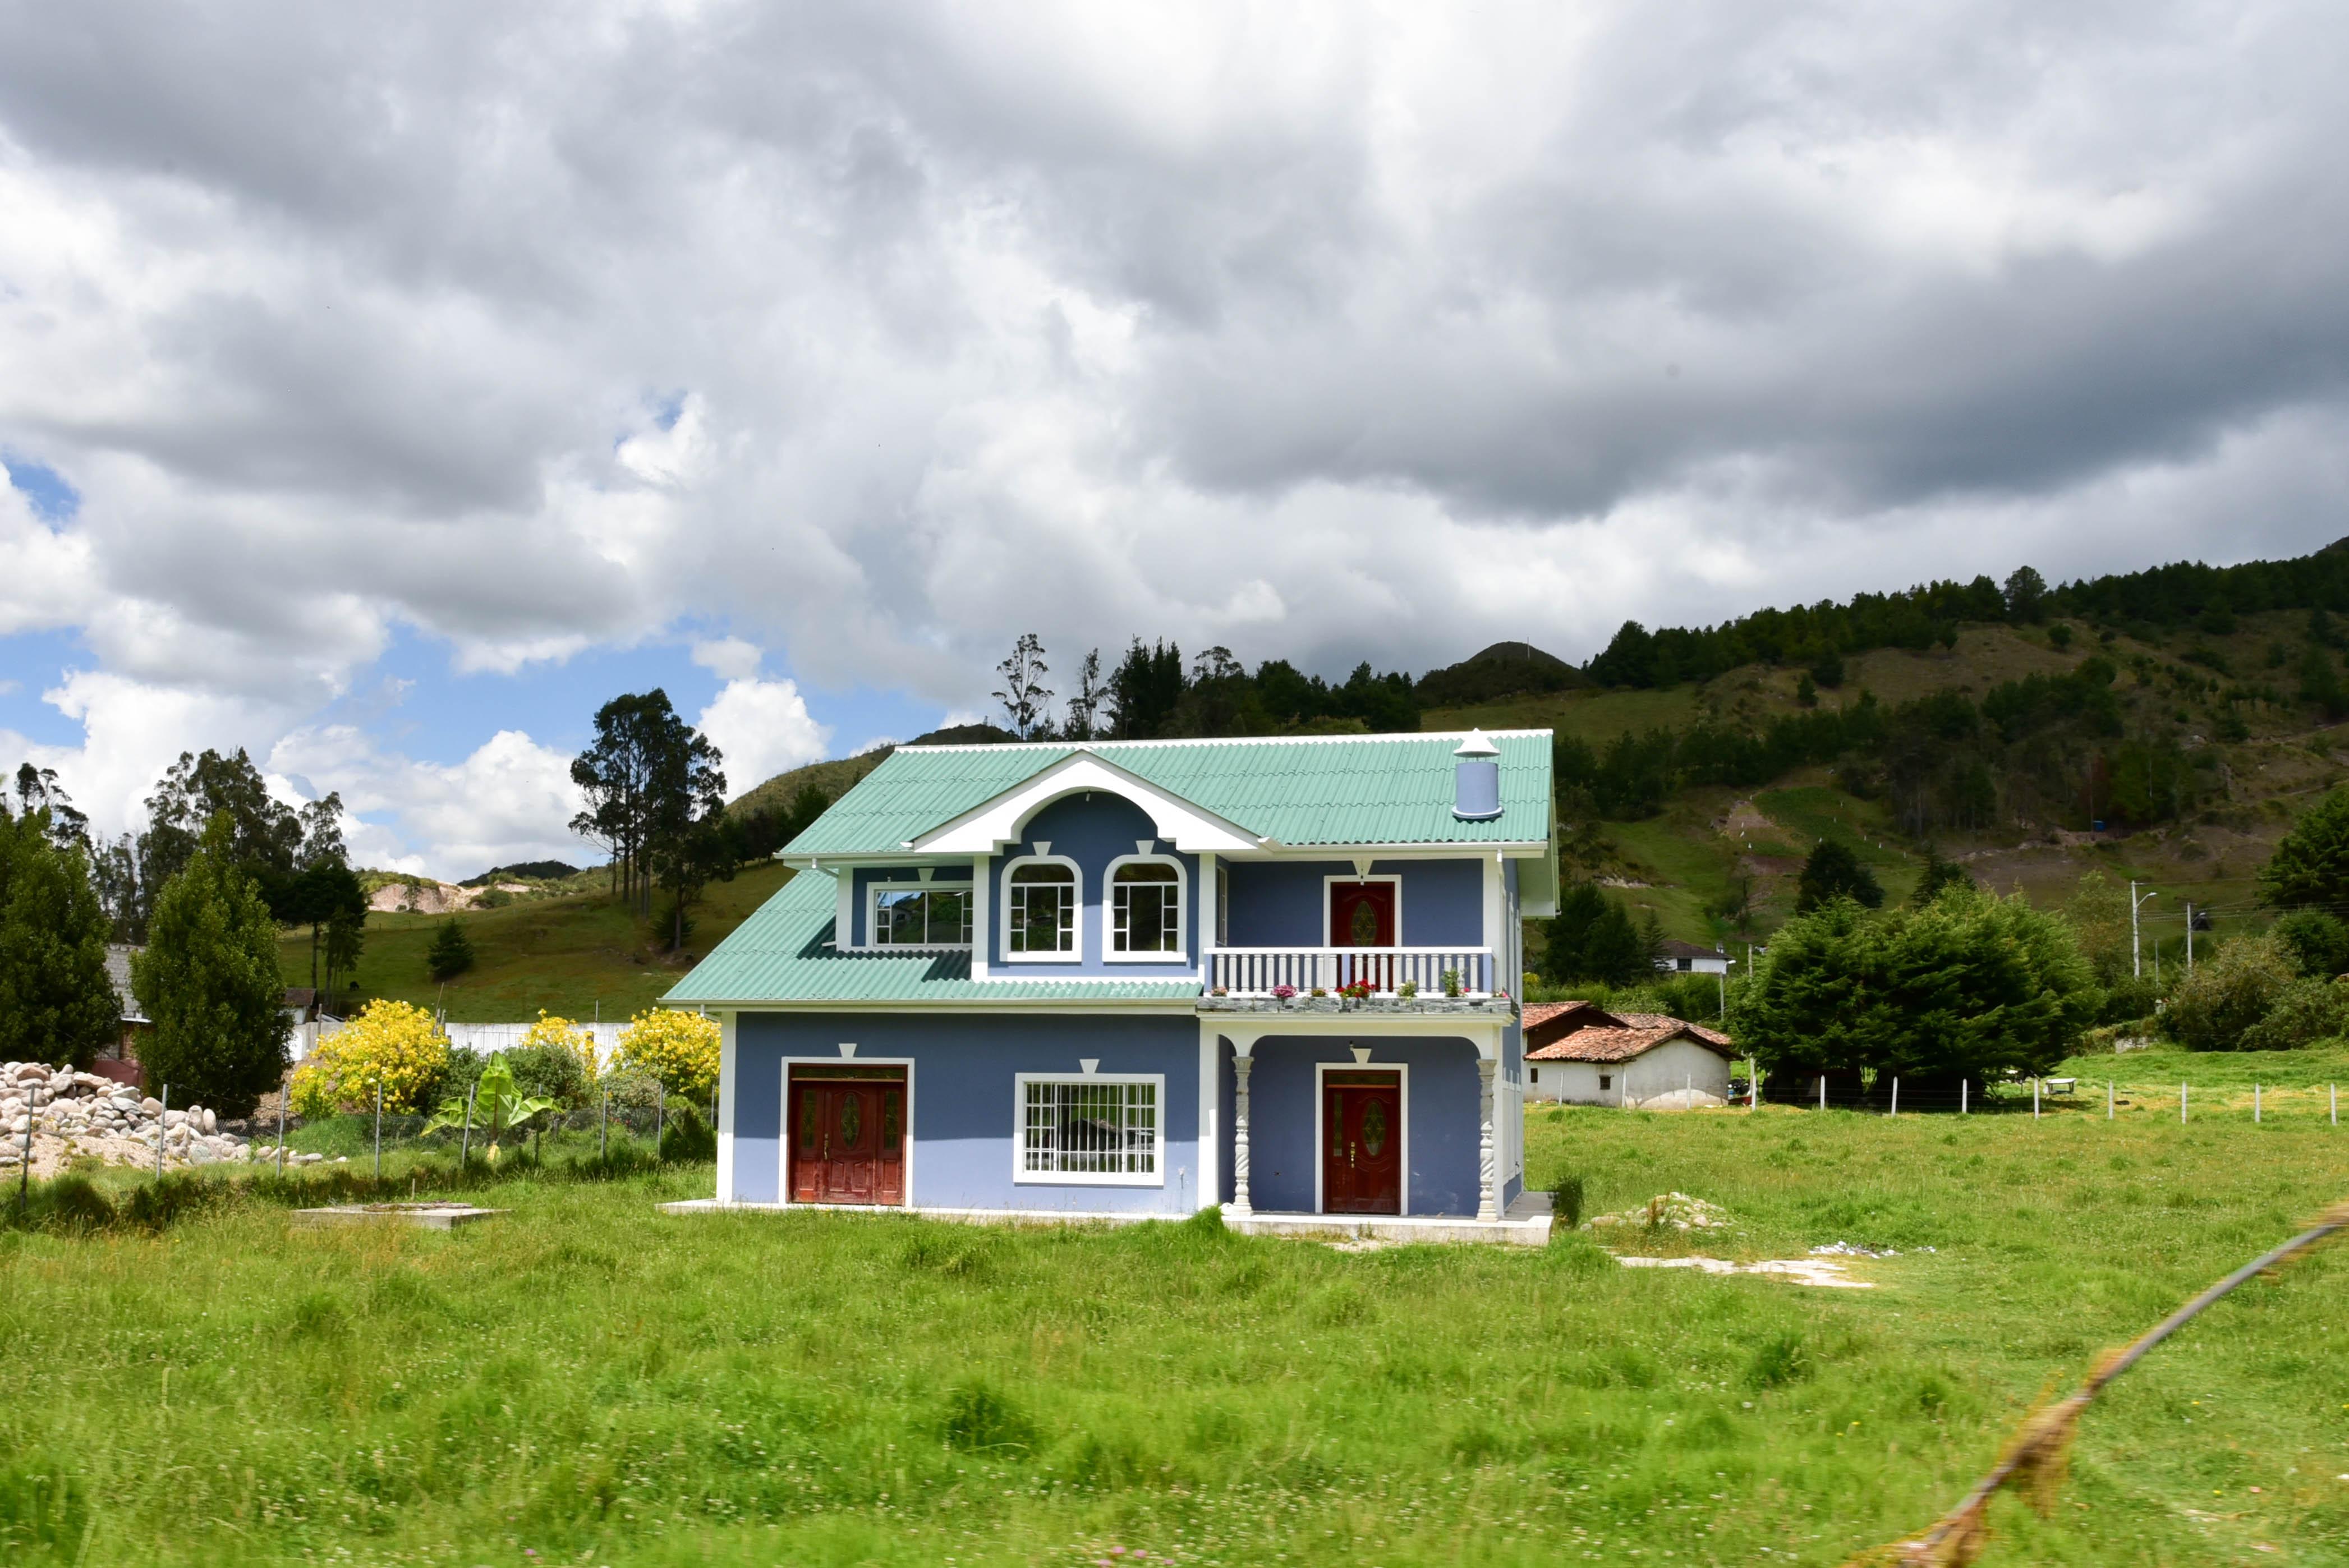 saraguro#tracht#ecuador#abenteuer#blog#blogger#reisefotografie ...